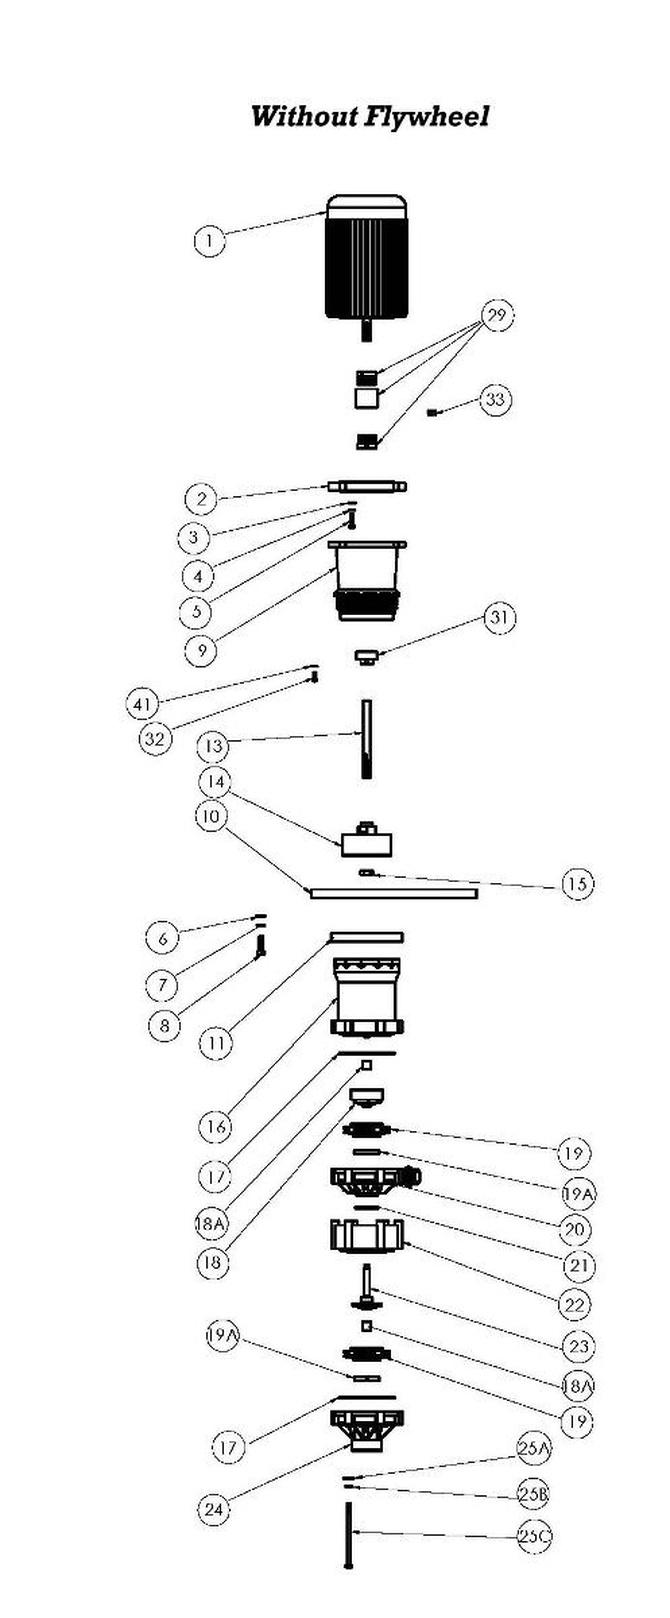 Finish-Thompson-FTI-MSVKC-Pump-Parts-Exploded-View-2.jpg